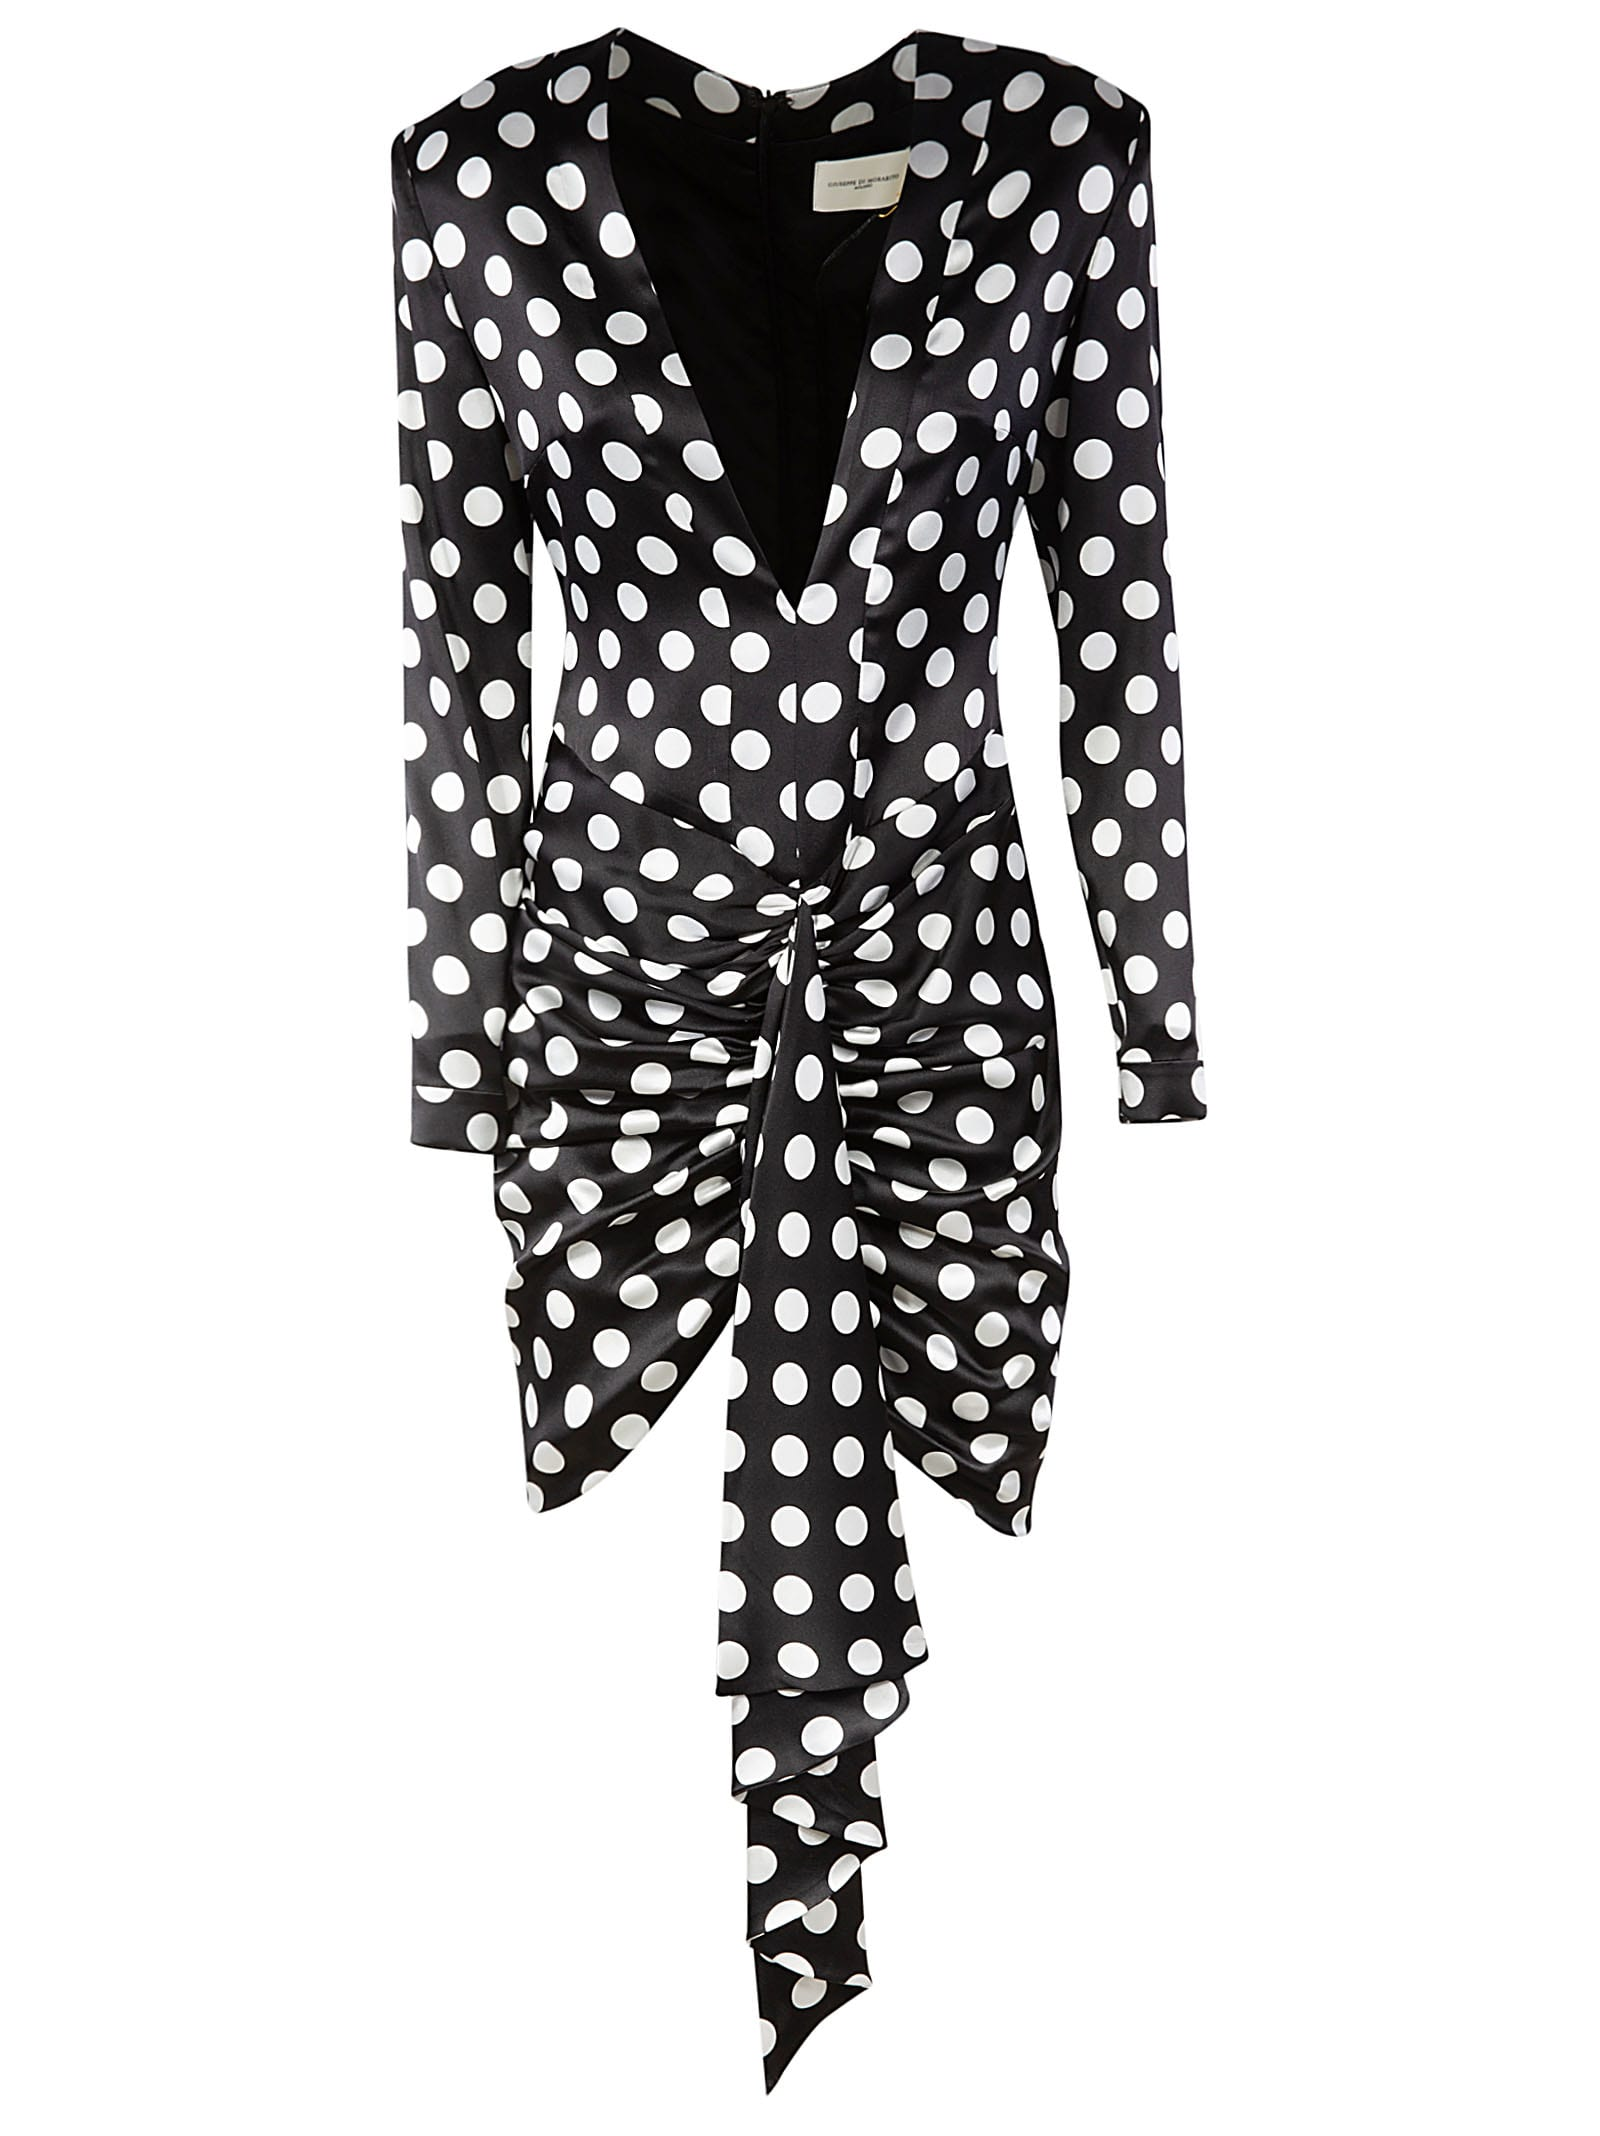 Buy Giuseppe di Morabito Dotted Draped Short Dress online, shop Giuseppe di Morabito with free shipping